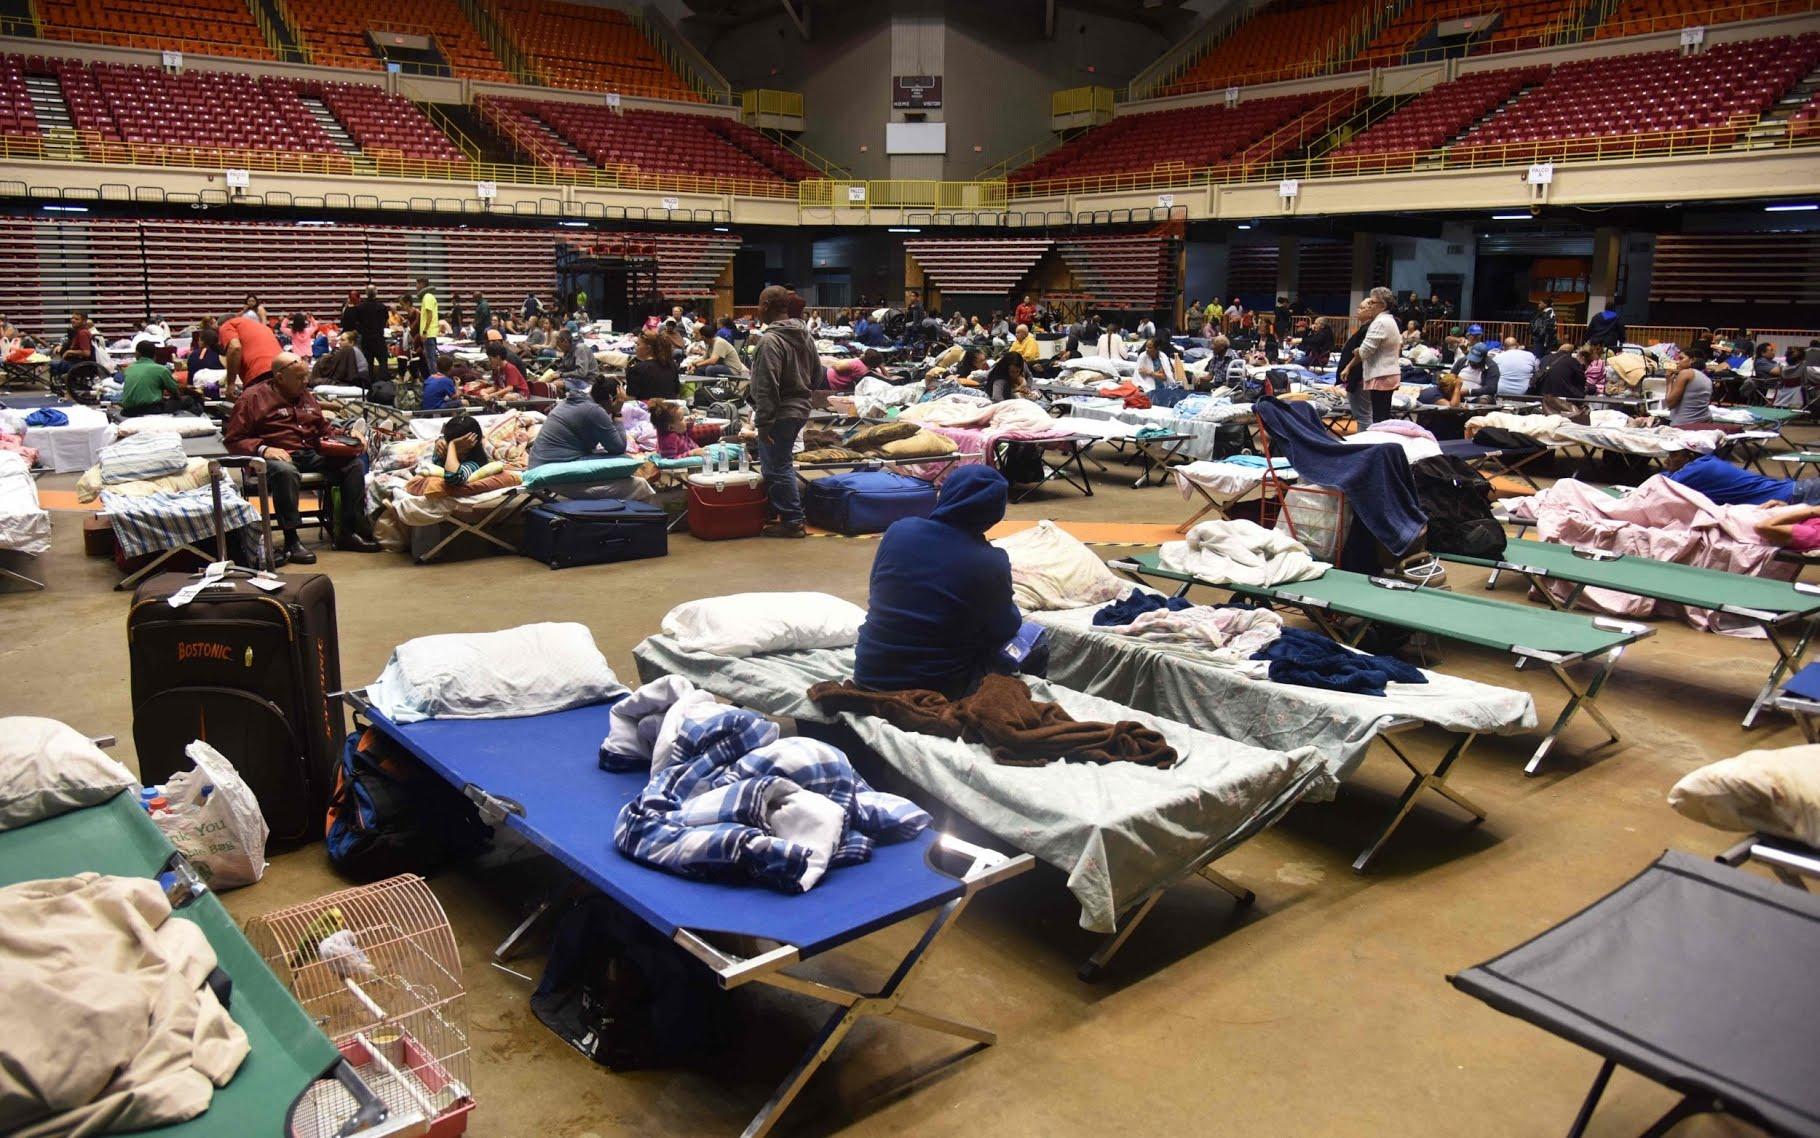 Puerto Ricans take refuge at a shelter in San Juan